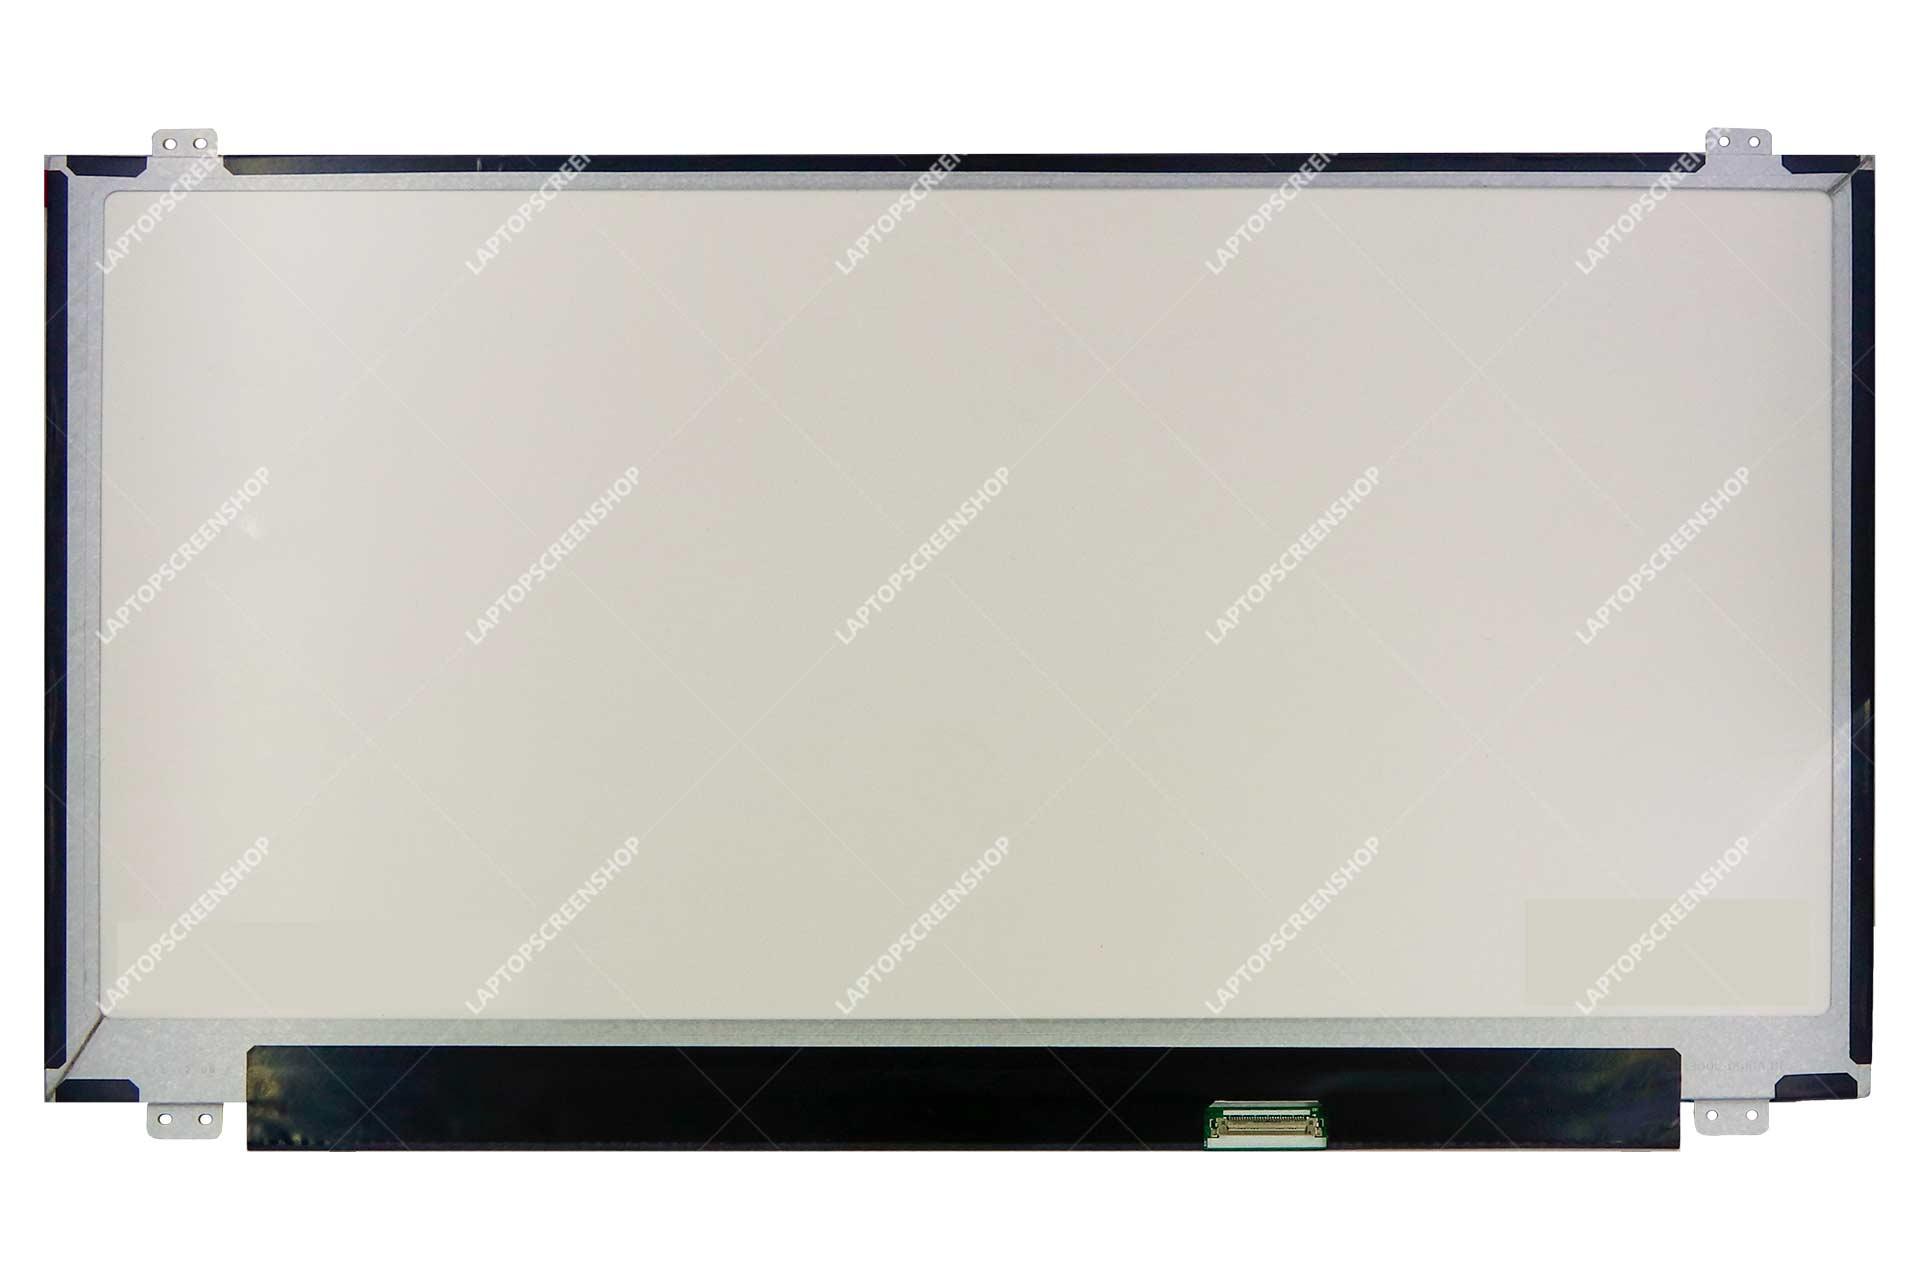 ACER-ASPIRE-E1-522-5885-LCD |HD|فروشگاه لپ تاپ اسکرين | تعمير لپ تاپ